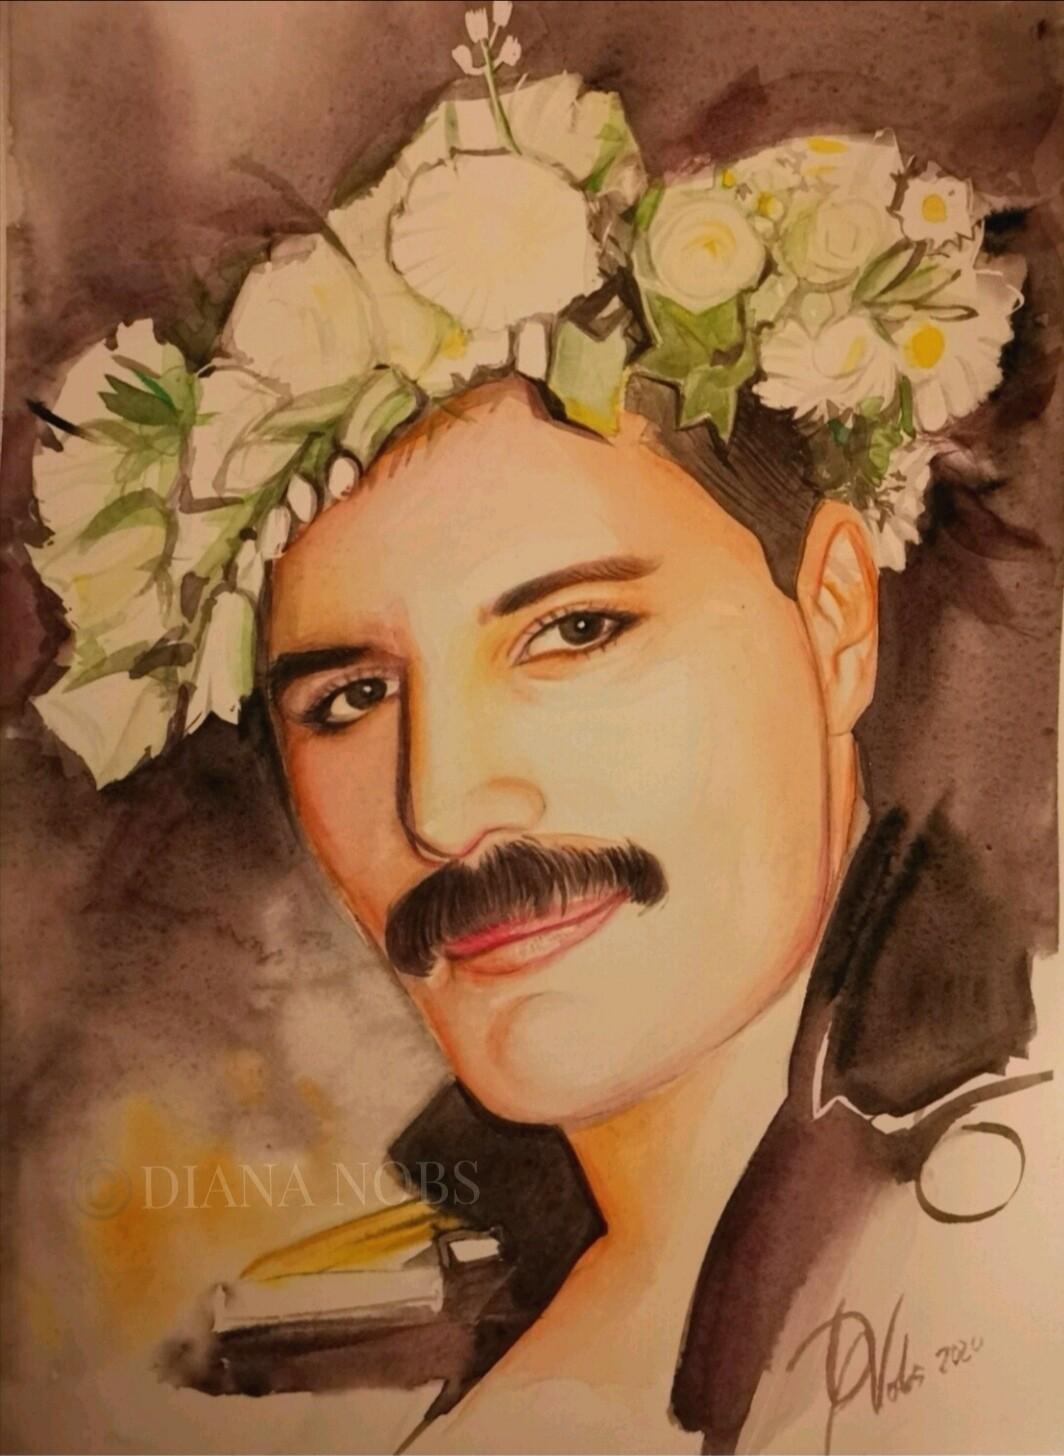 Freddie Mercury's portrait /Original